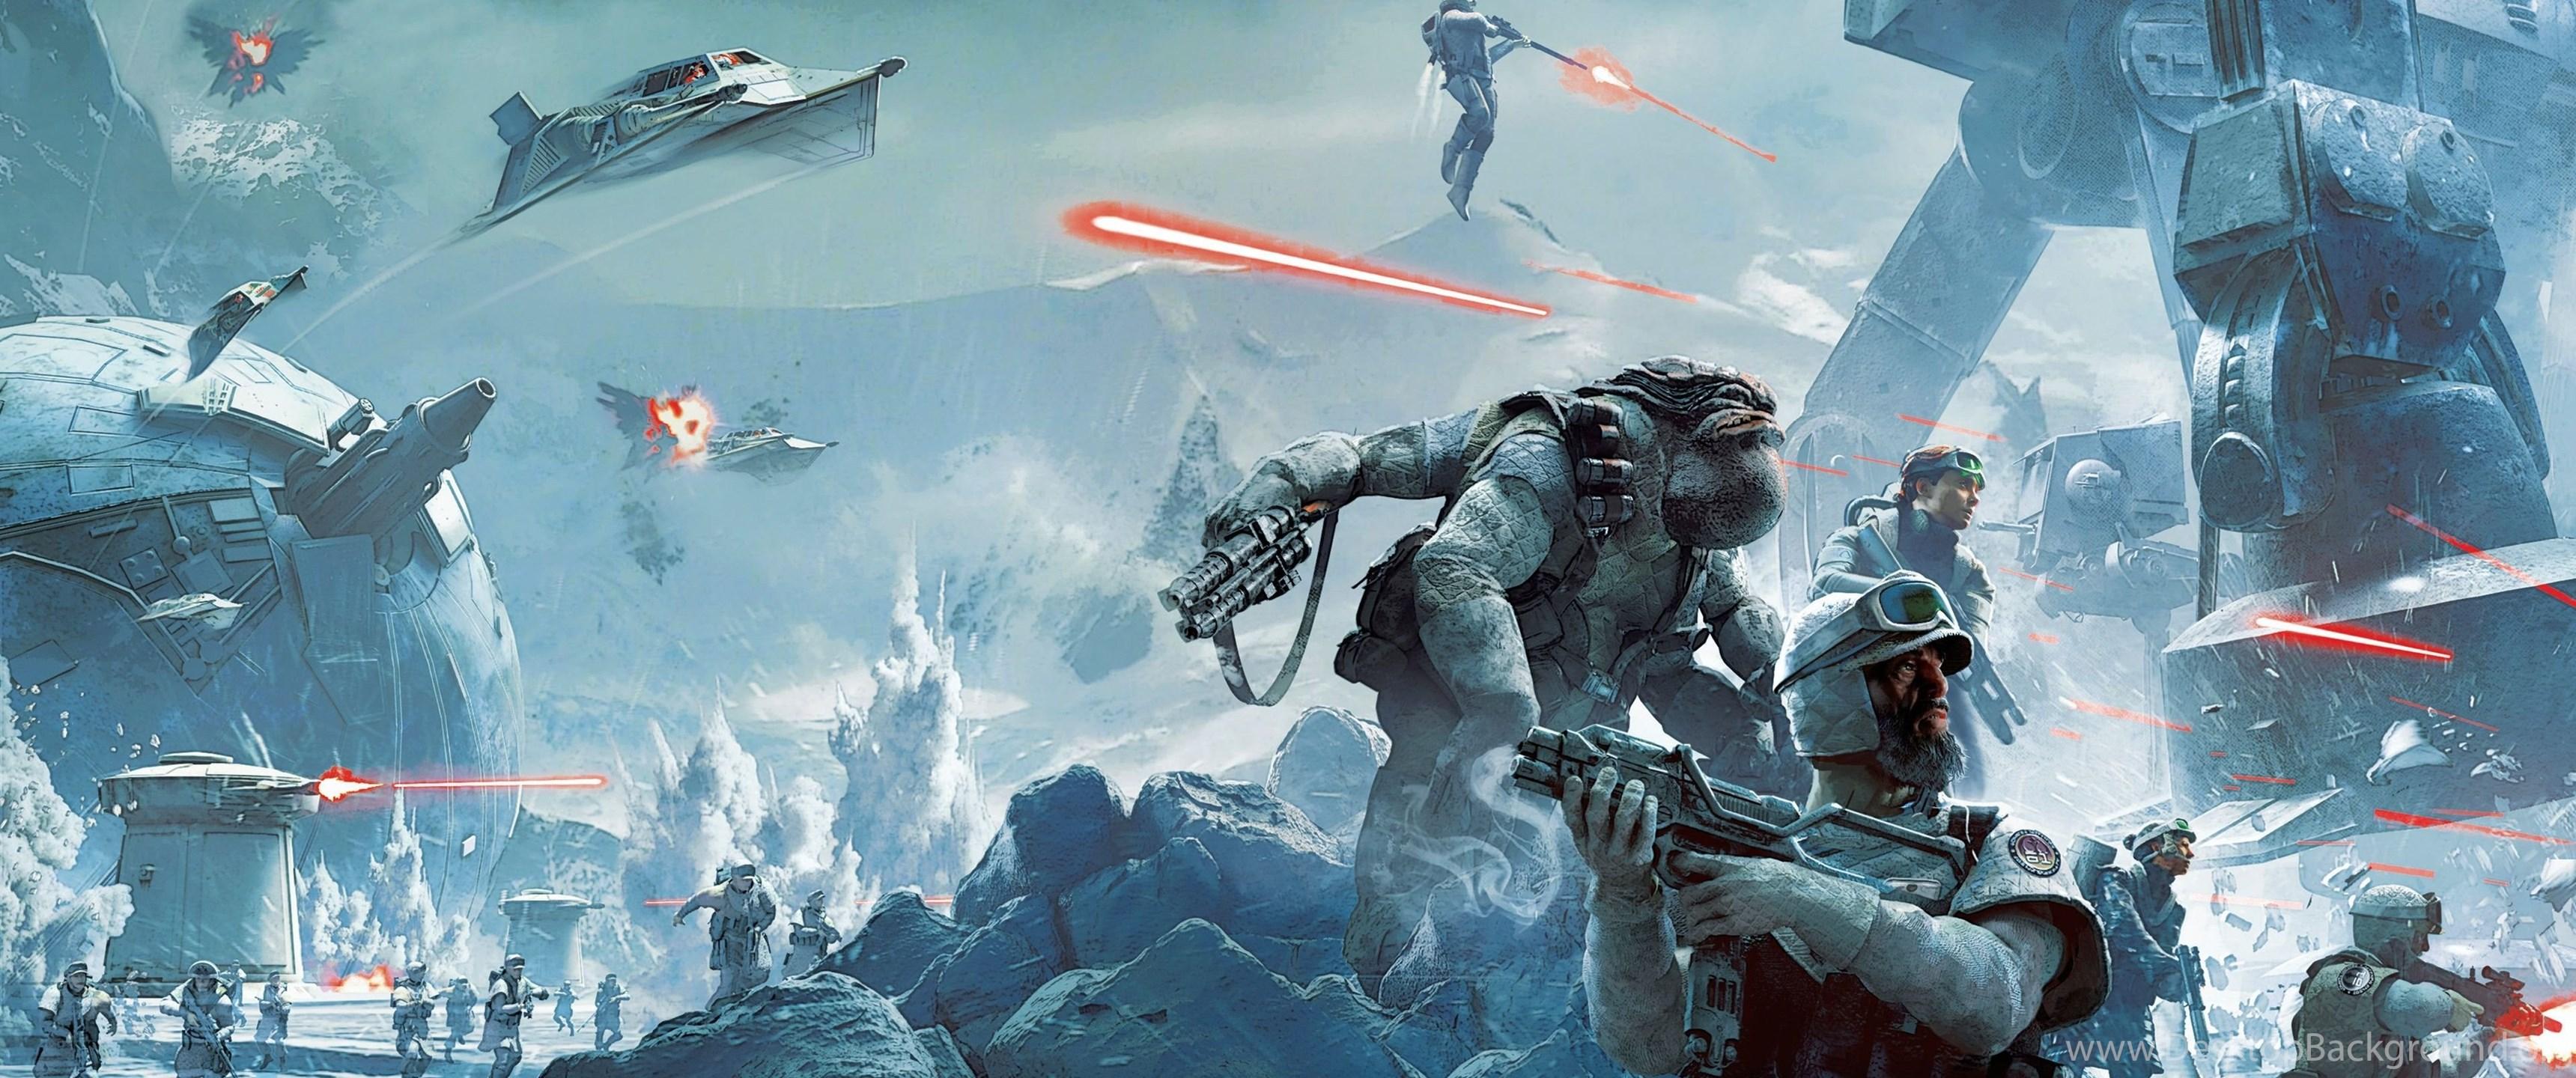 Daisy Ridley Rey Star Wars The Force Awakens Movie Desktop Wallpapers Desktop Background